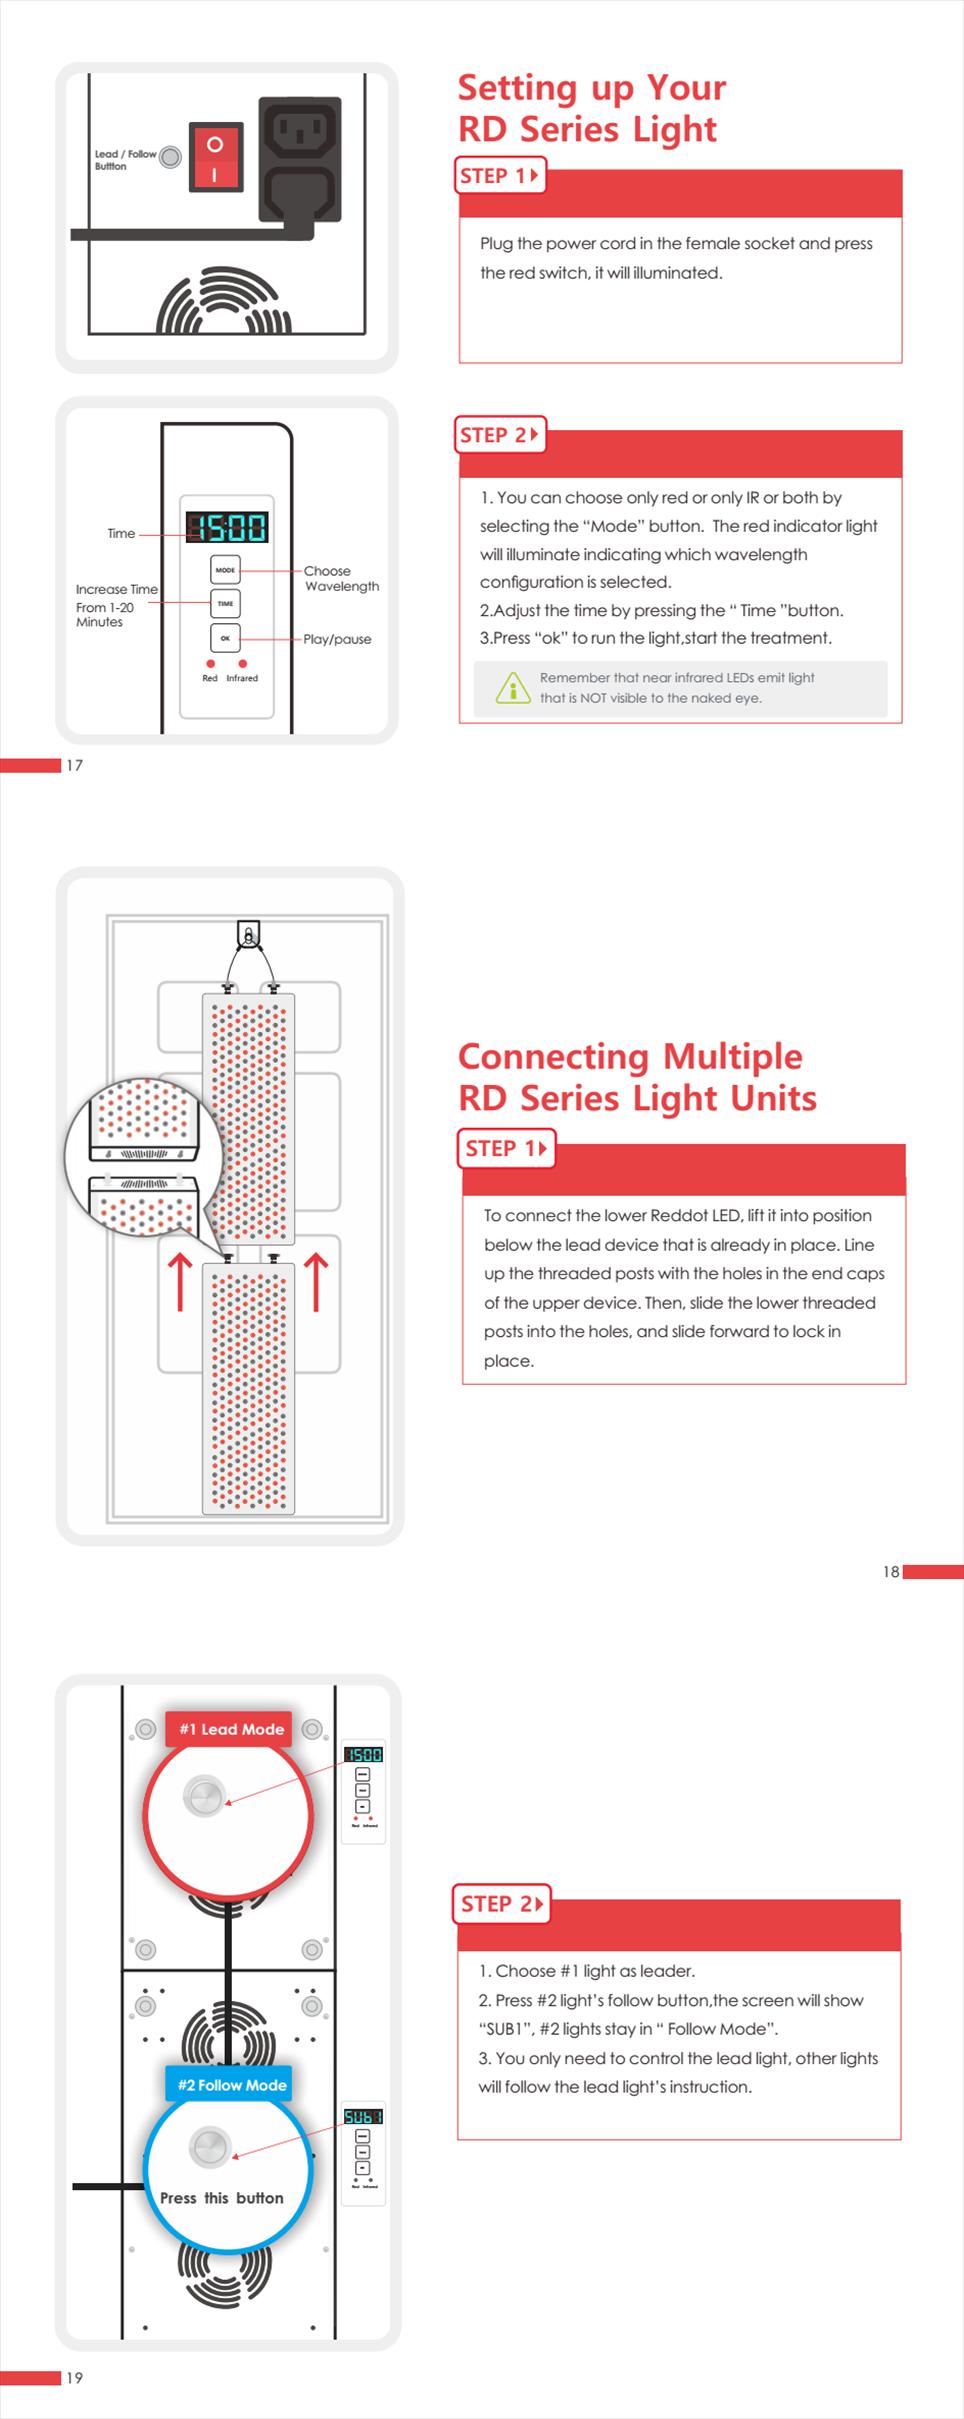 connectingpanels.png